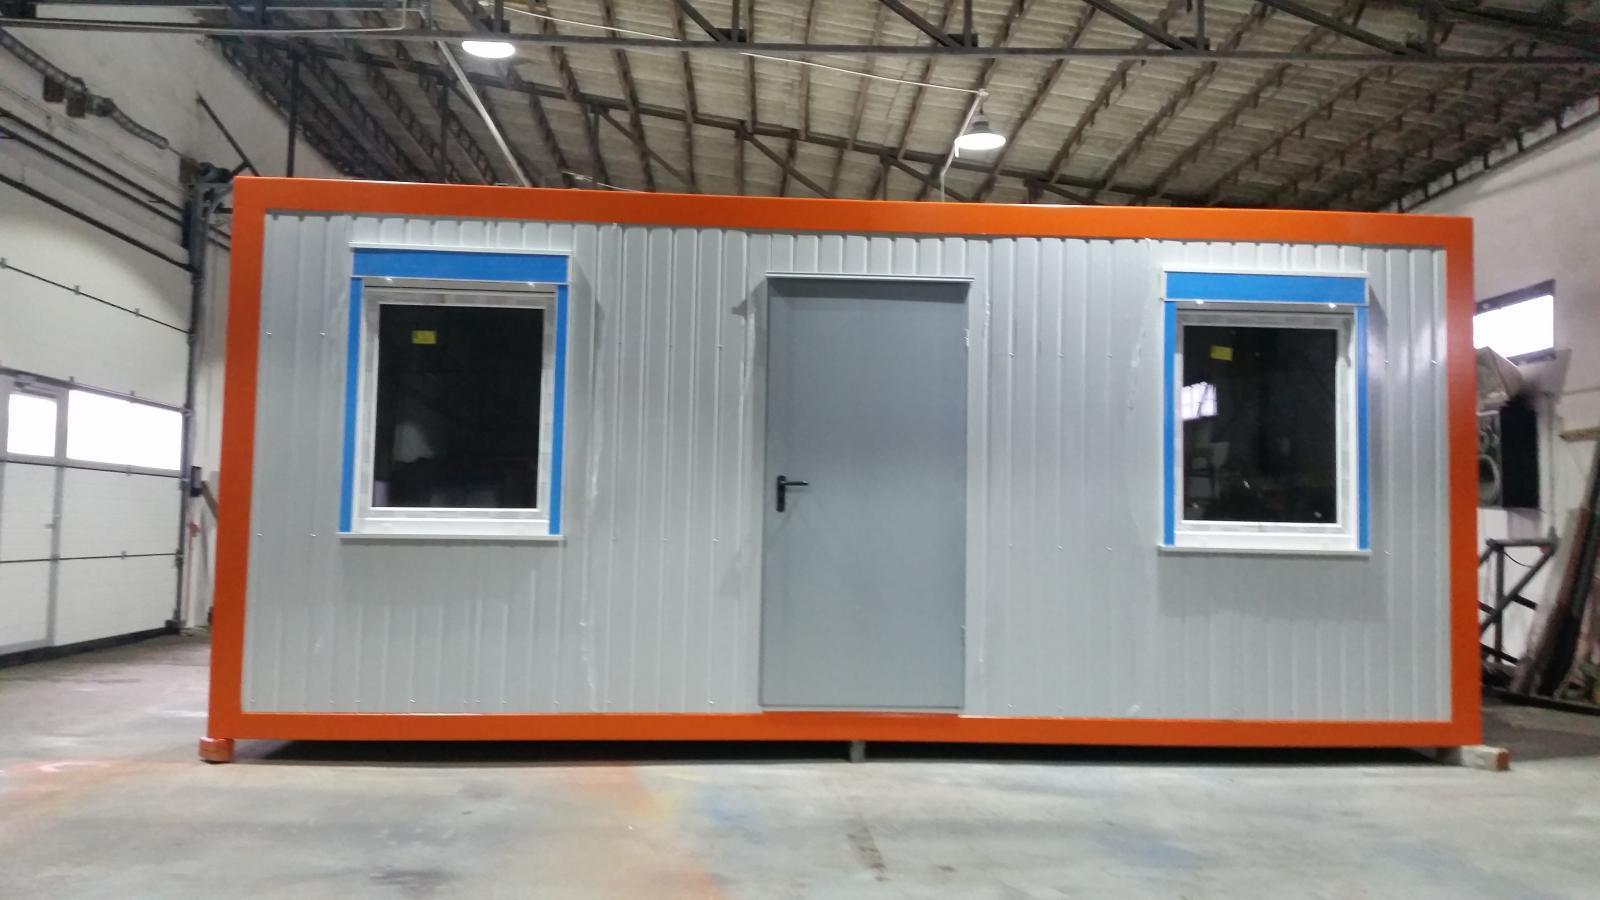 Wohncontainer Burocontainer Neu Pl Wper 2571 Jm